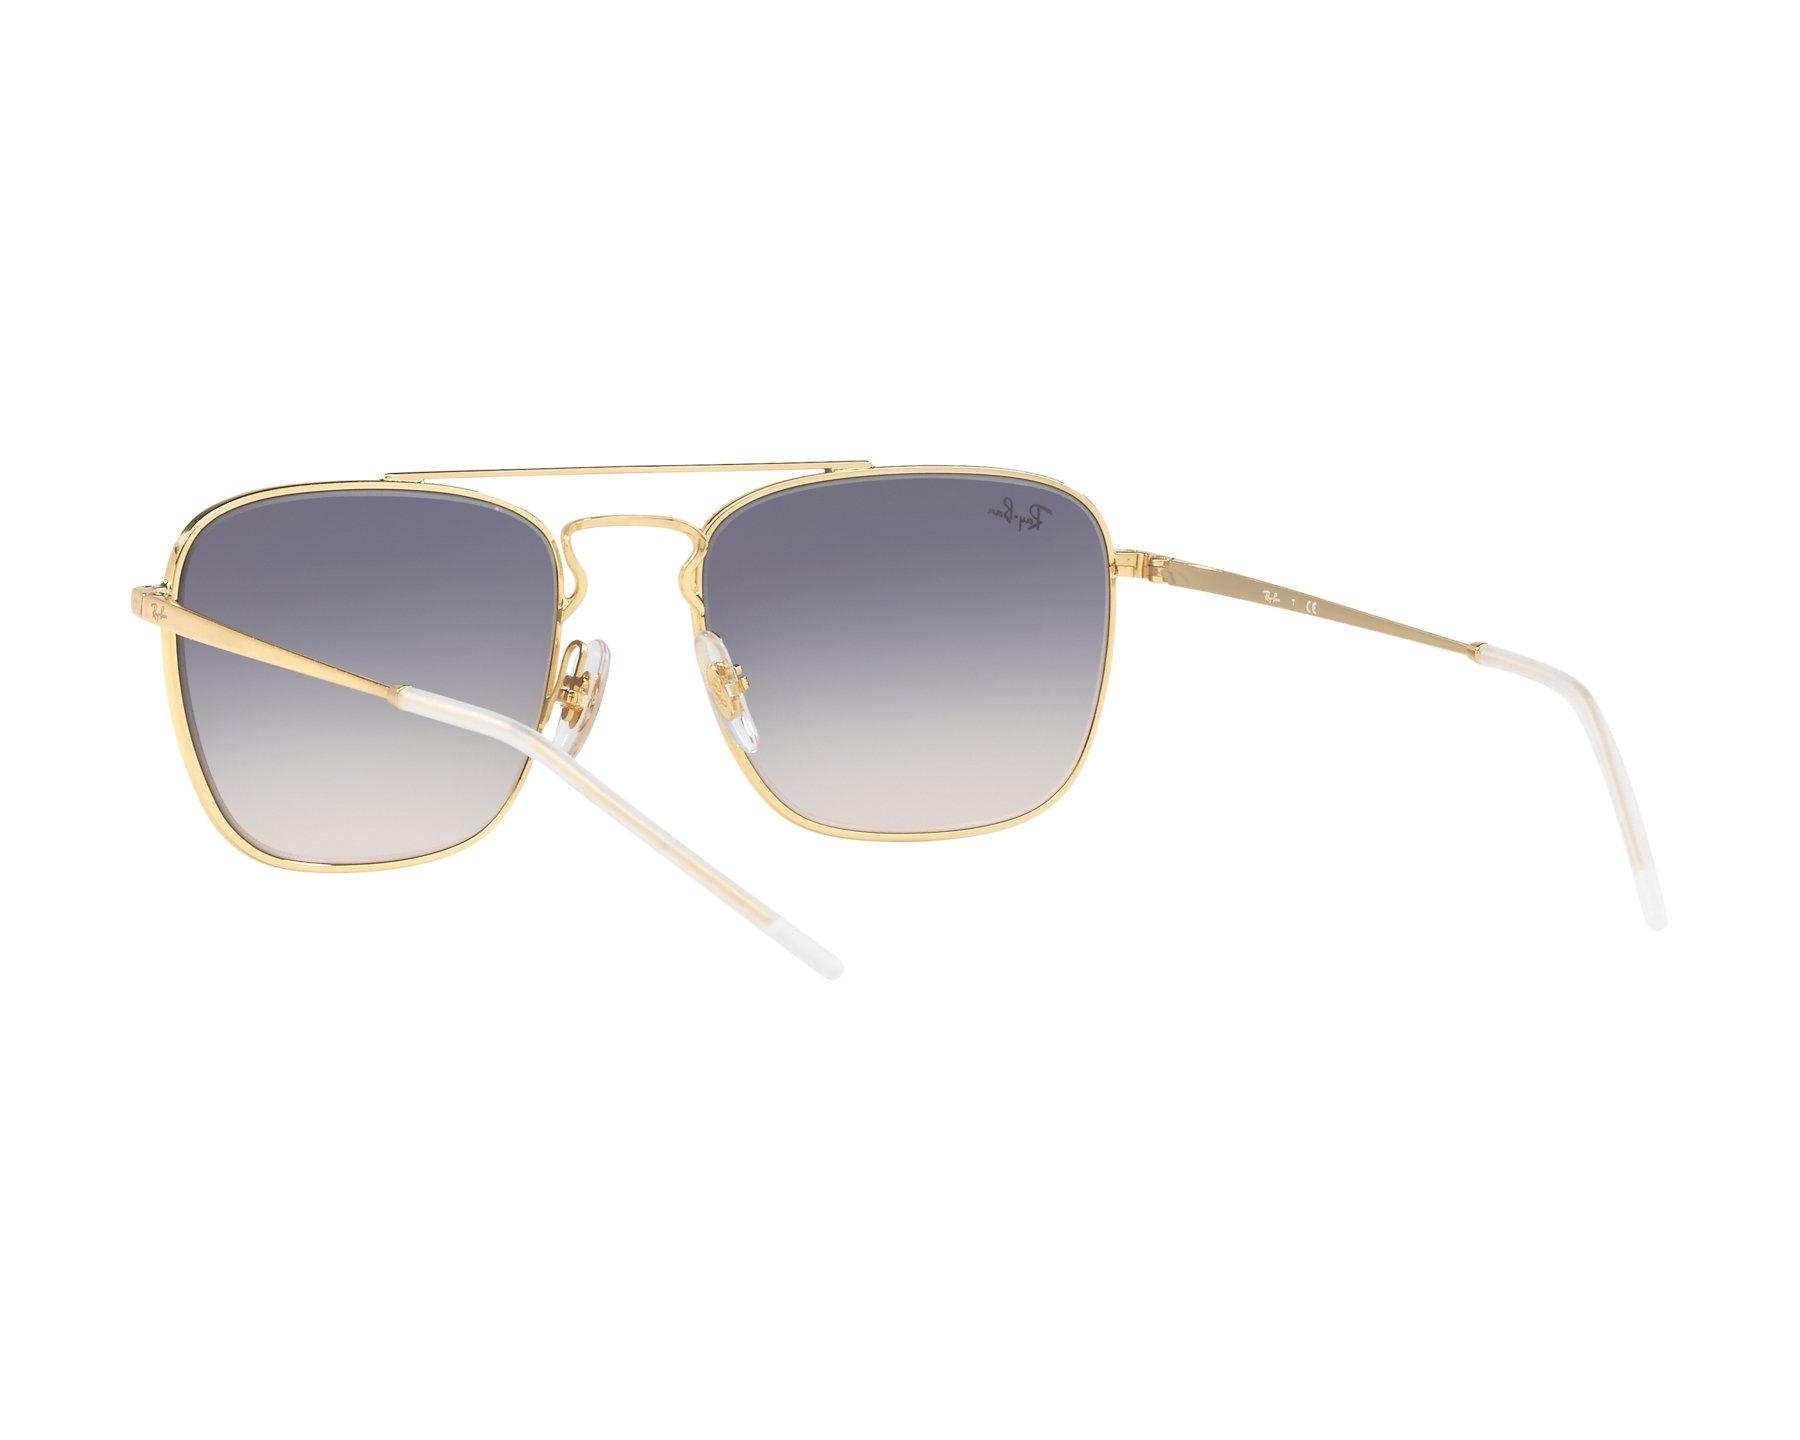 fa1ed9ddaae Sunglasses Ray-Ban RB-3588 9063l9 55-19 Grey Gold 360 degree view